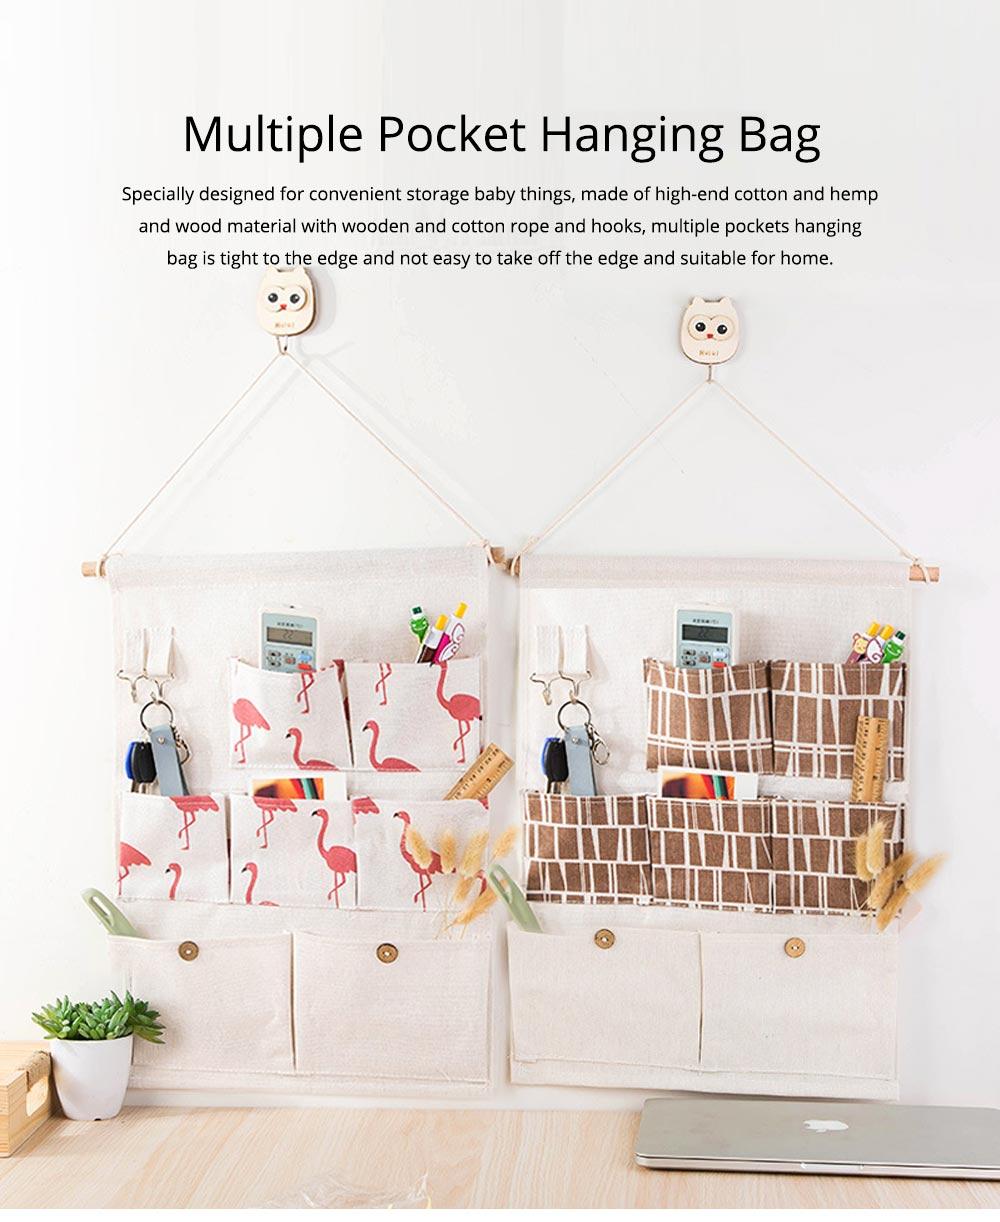 Printed Multiple Pocket Hanging Bag Wall Hanging Bag with Wooden Stick & Cotton Rope Design Storage Bag 0